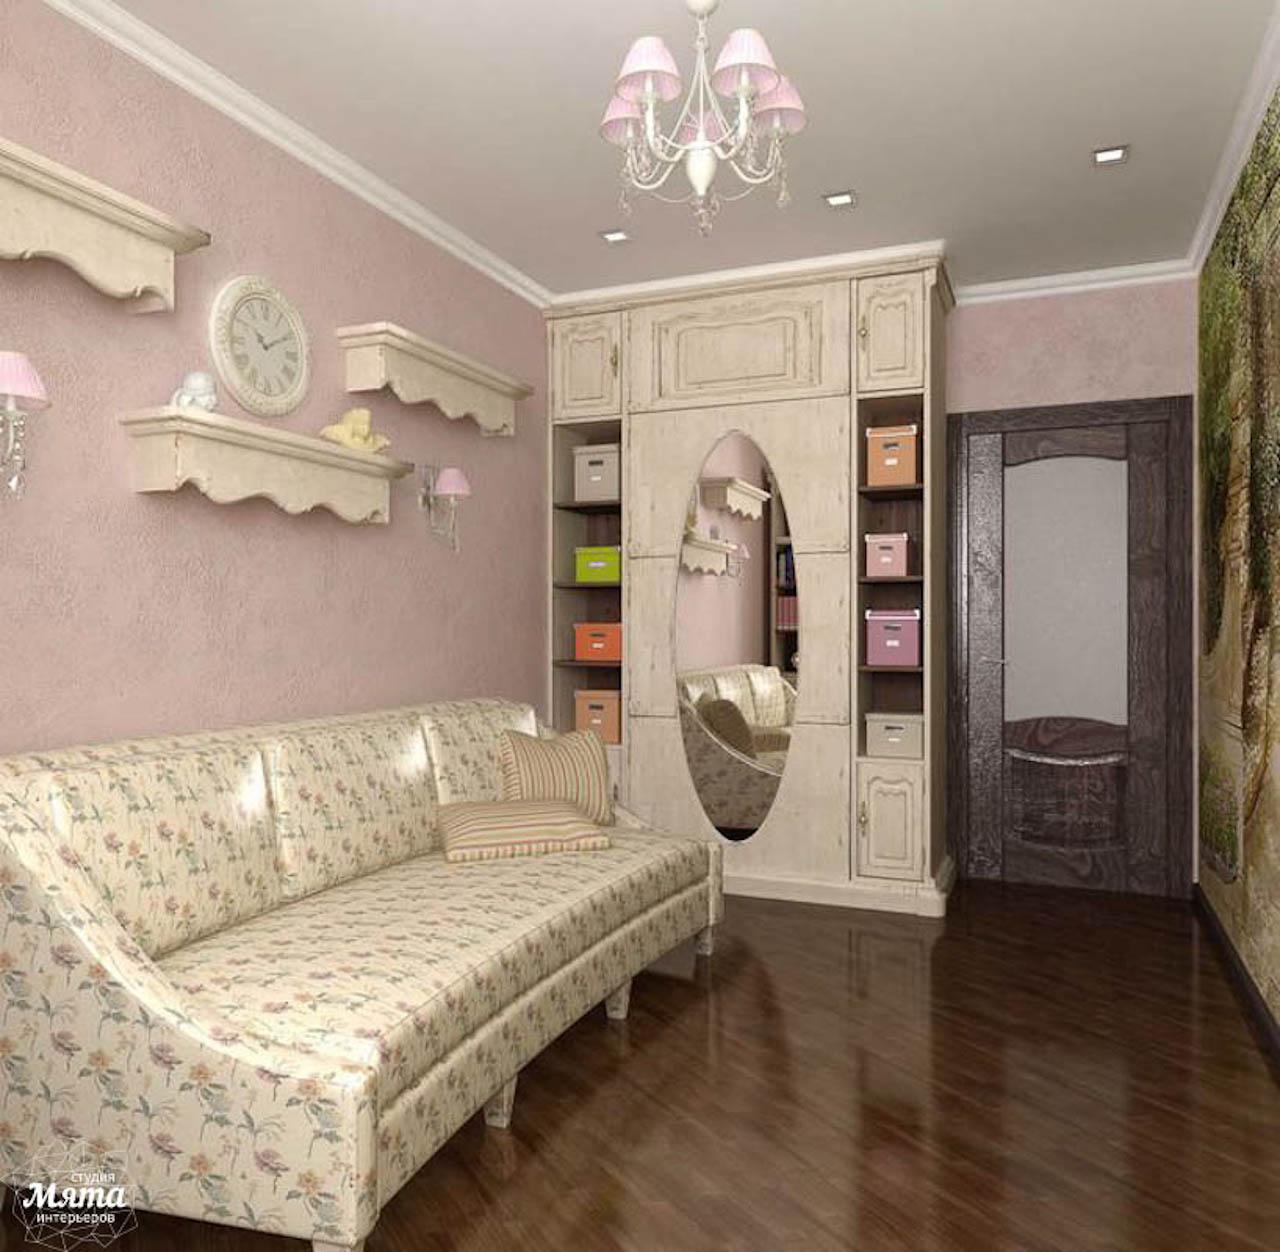 Дизайн интерьера двухкомнатной квартиры по ул. Юмашева 10 img1487229701